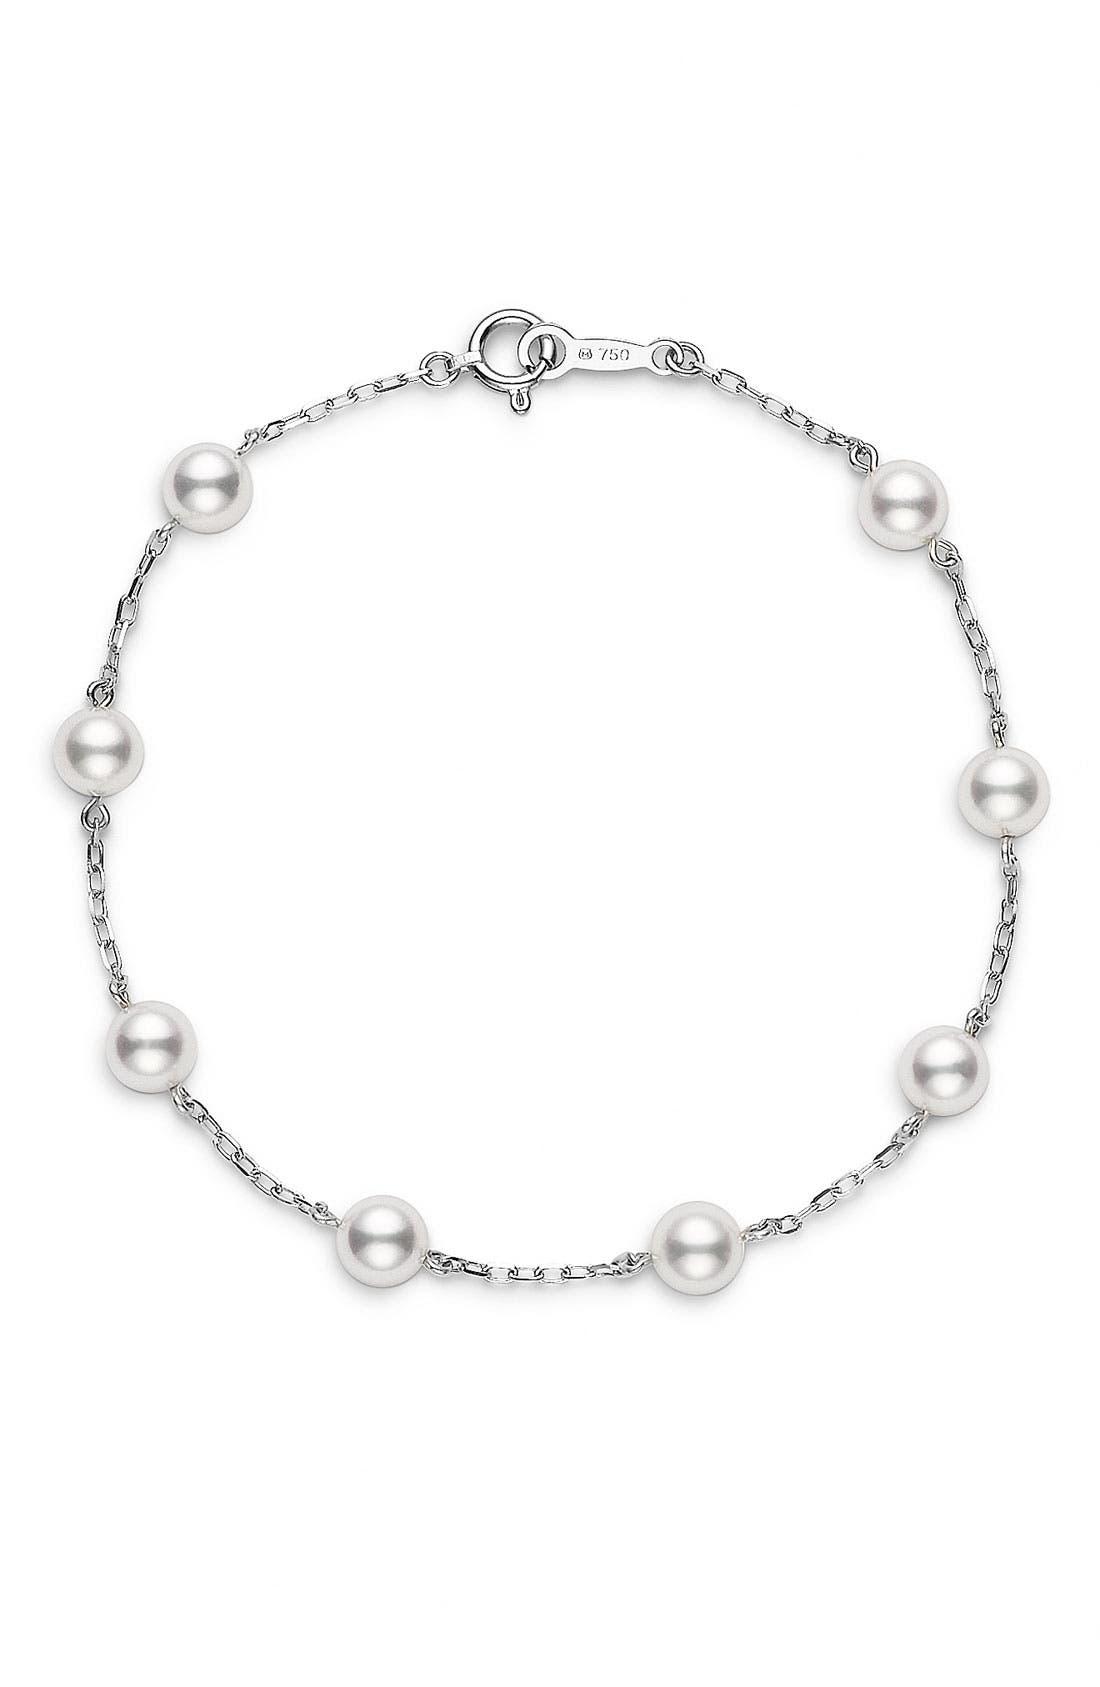 Main Image - Mikimoto Akoya Cultured Pearl & Chain Bracelet